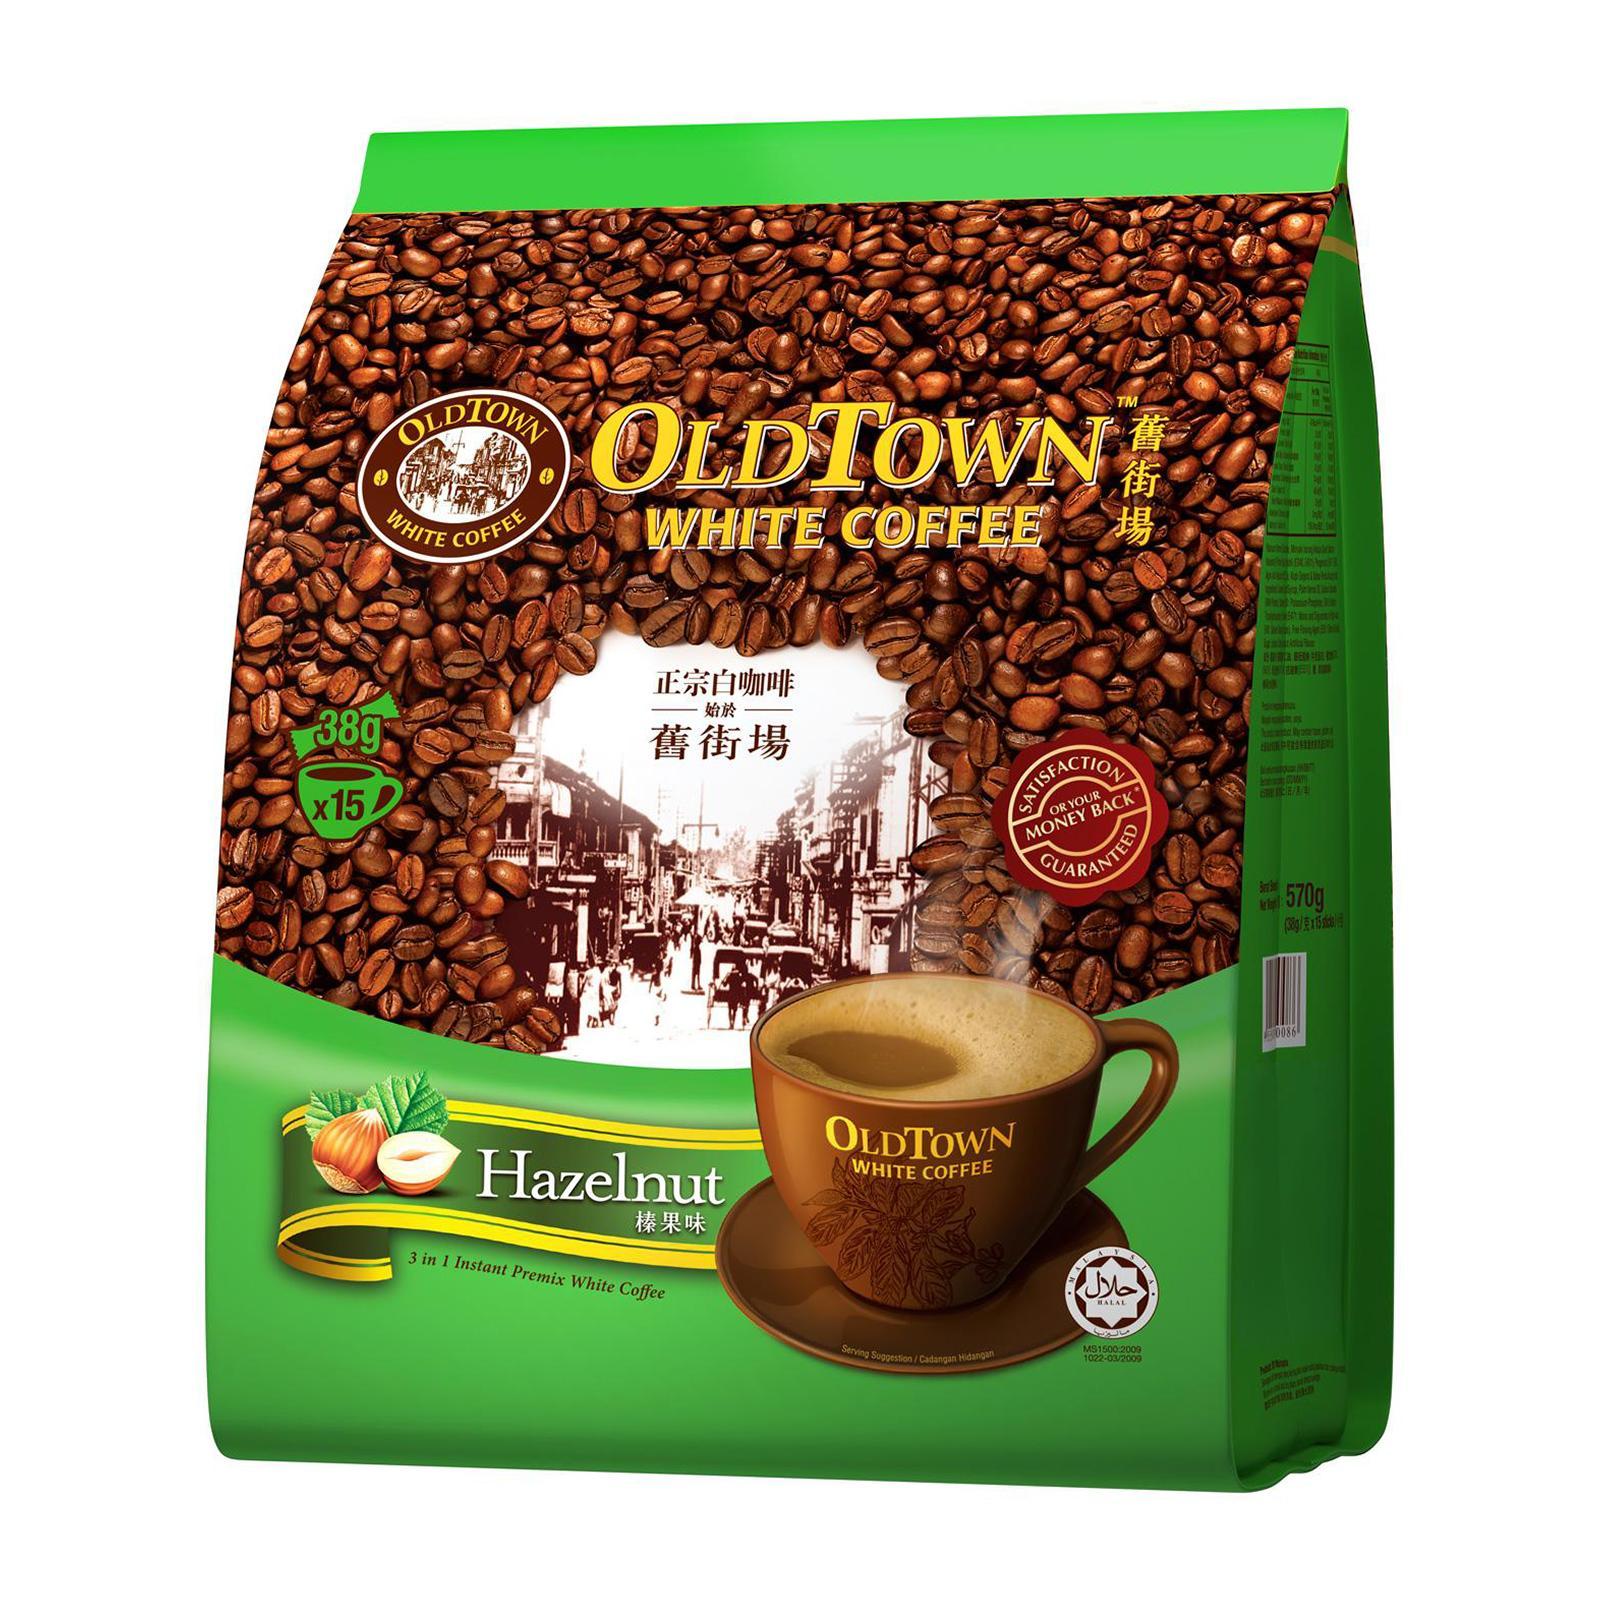 OLD TOWN White Coffee 3 in 1 Hazelnut 15sX38g